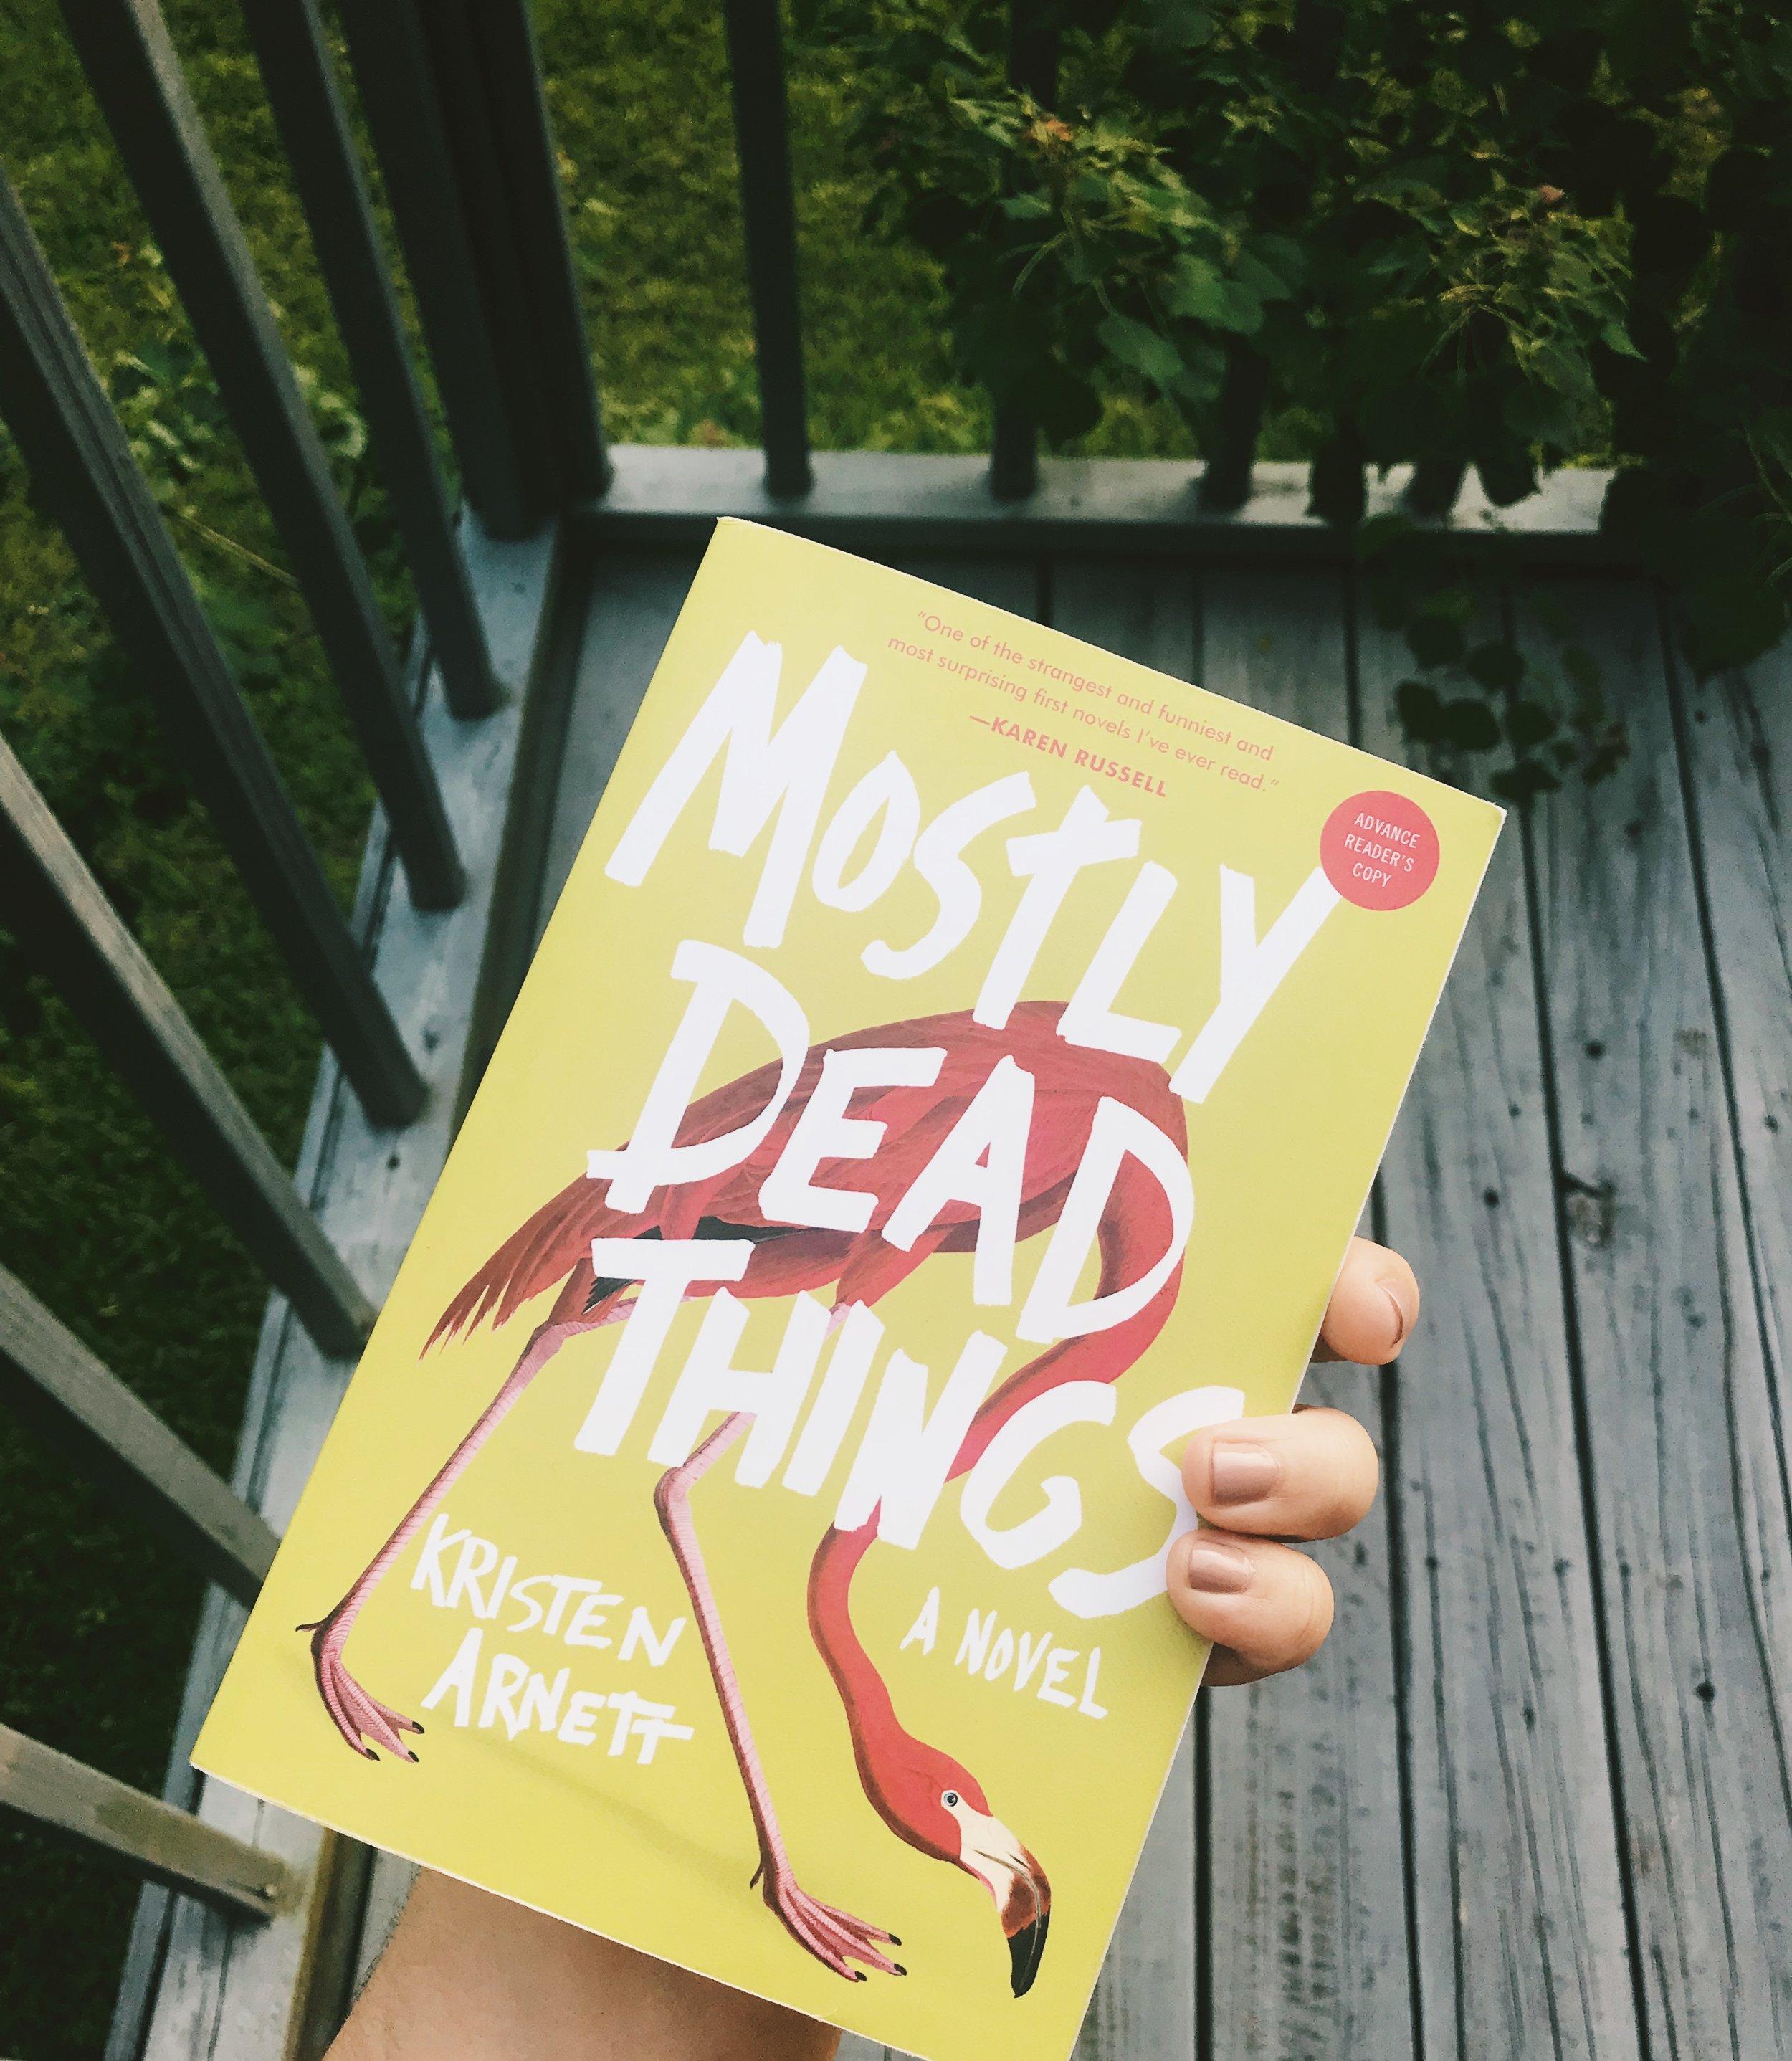 Raquel Reyes Mostly Dead Things Kristen Arnett Book Review.JPG